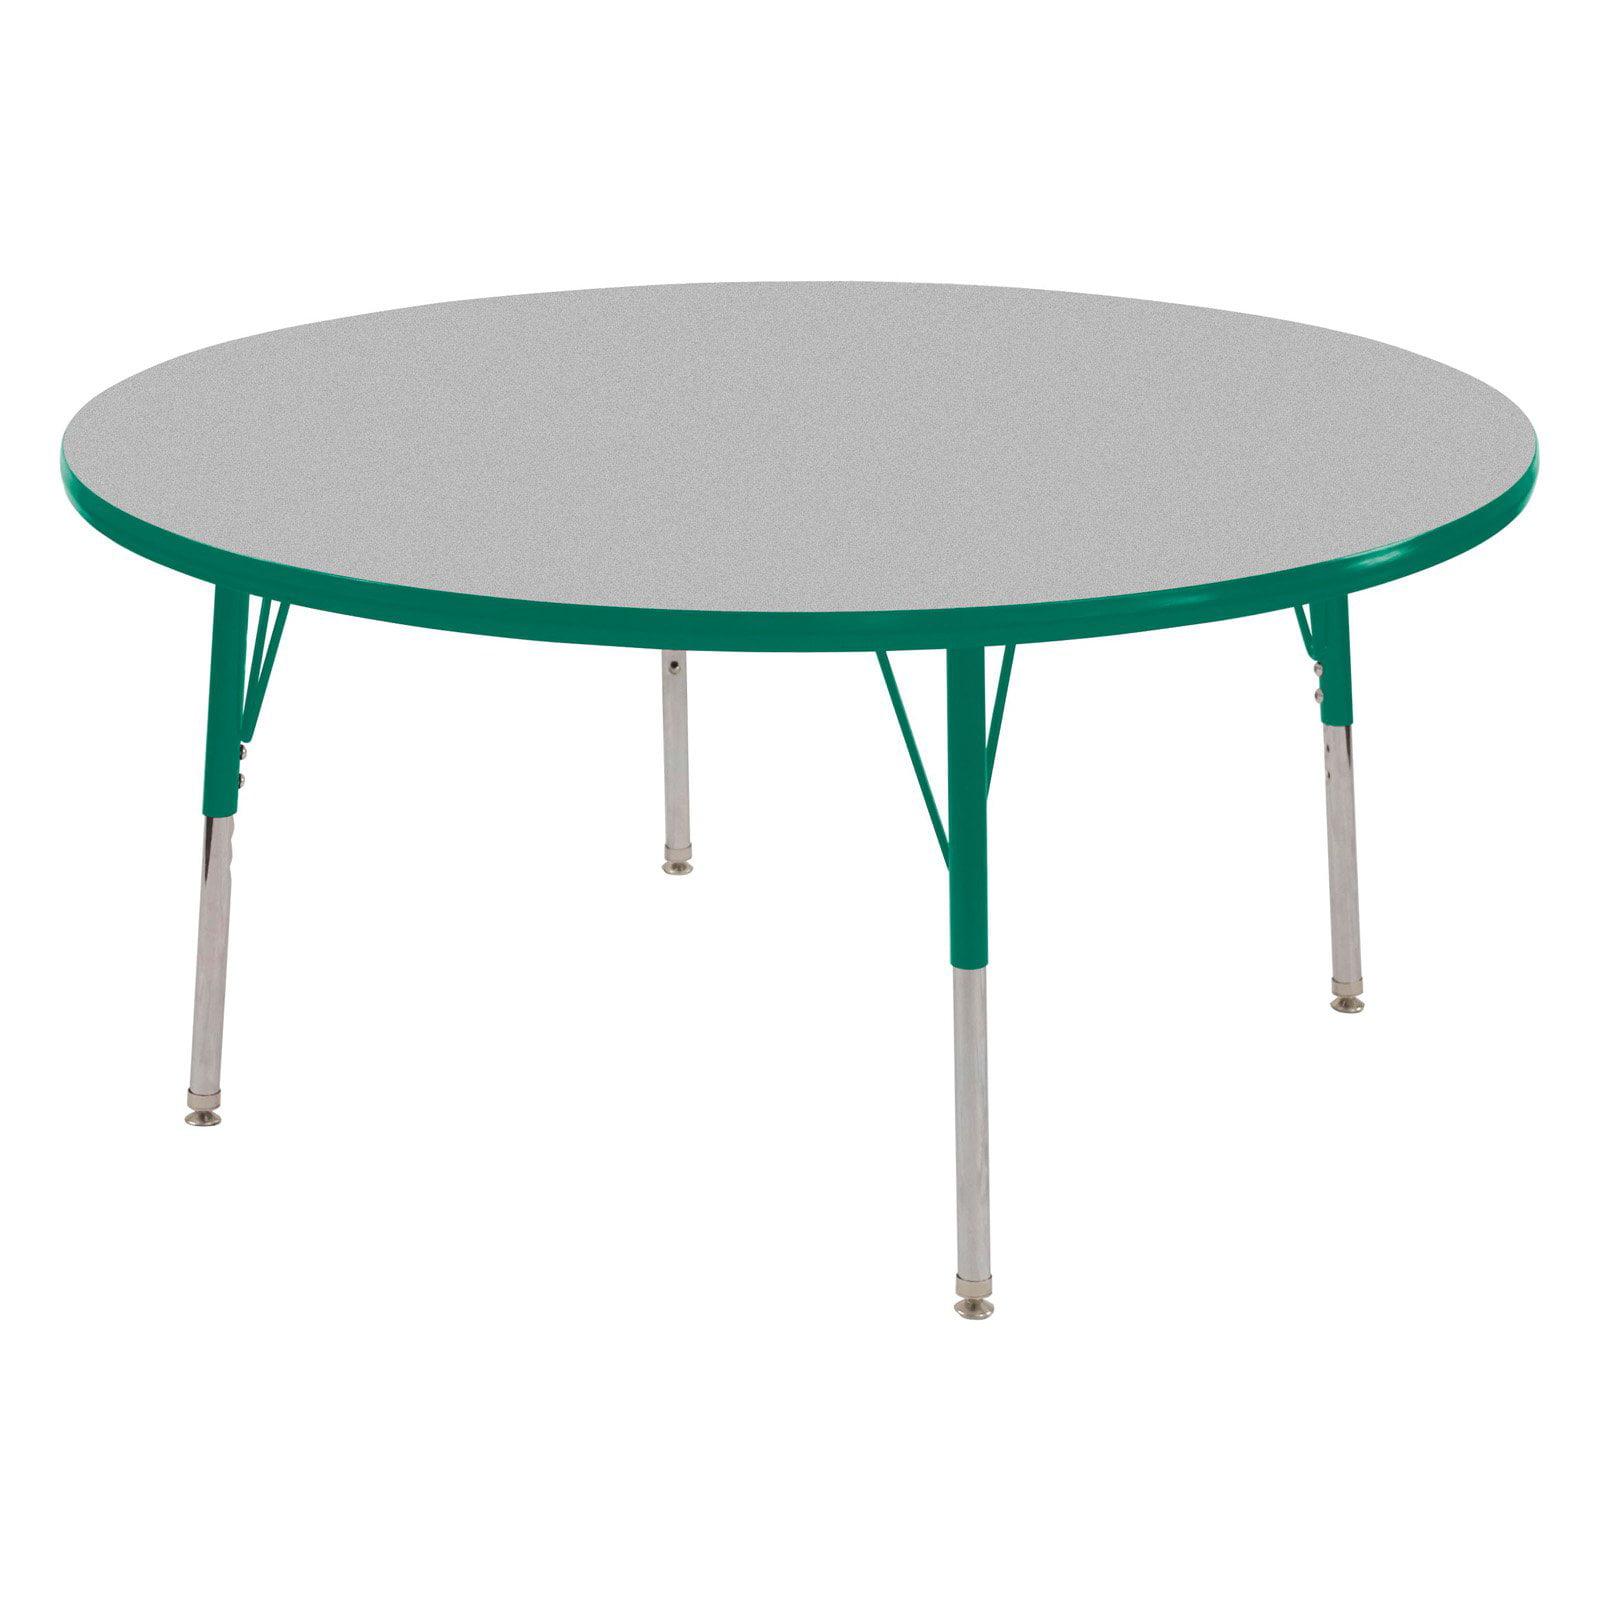 "ECR4Kids Round Table 48"" Diameter"